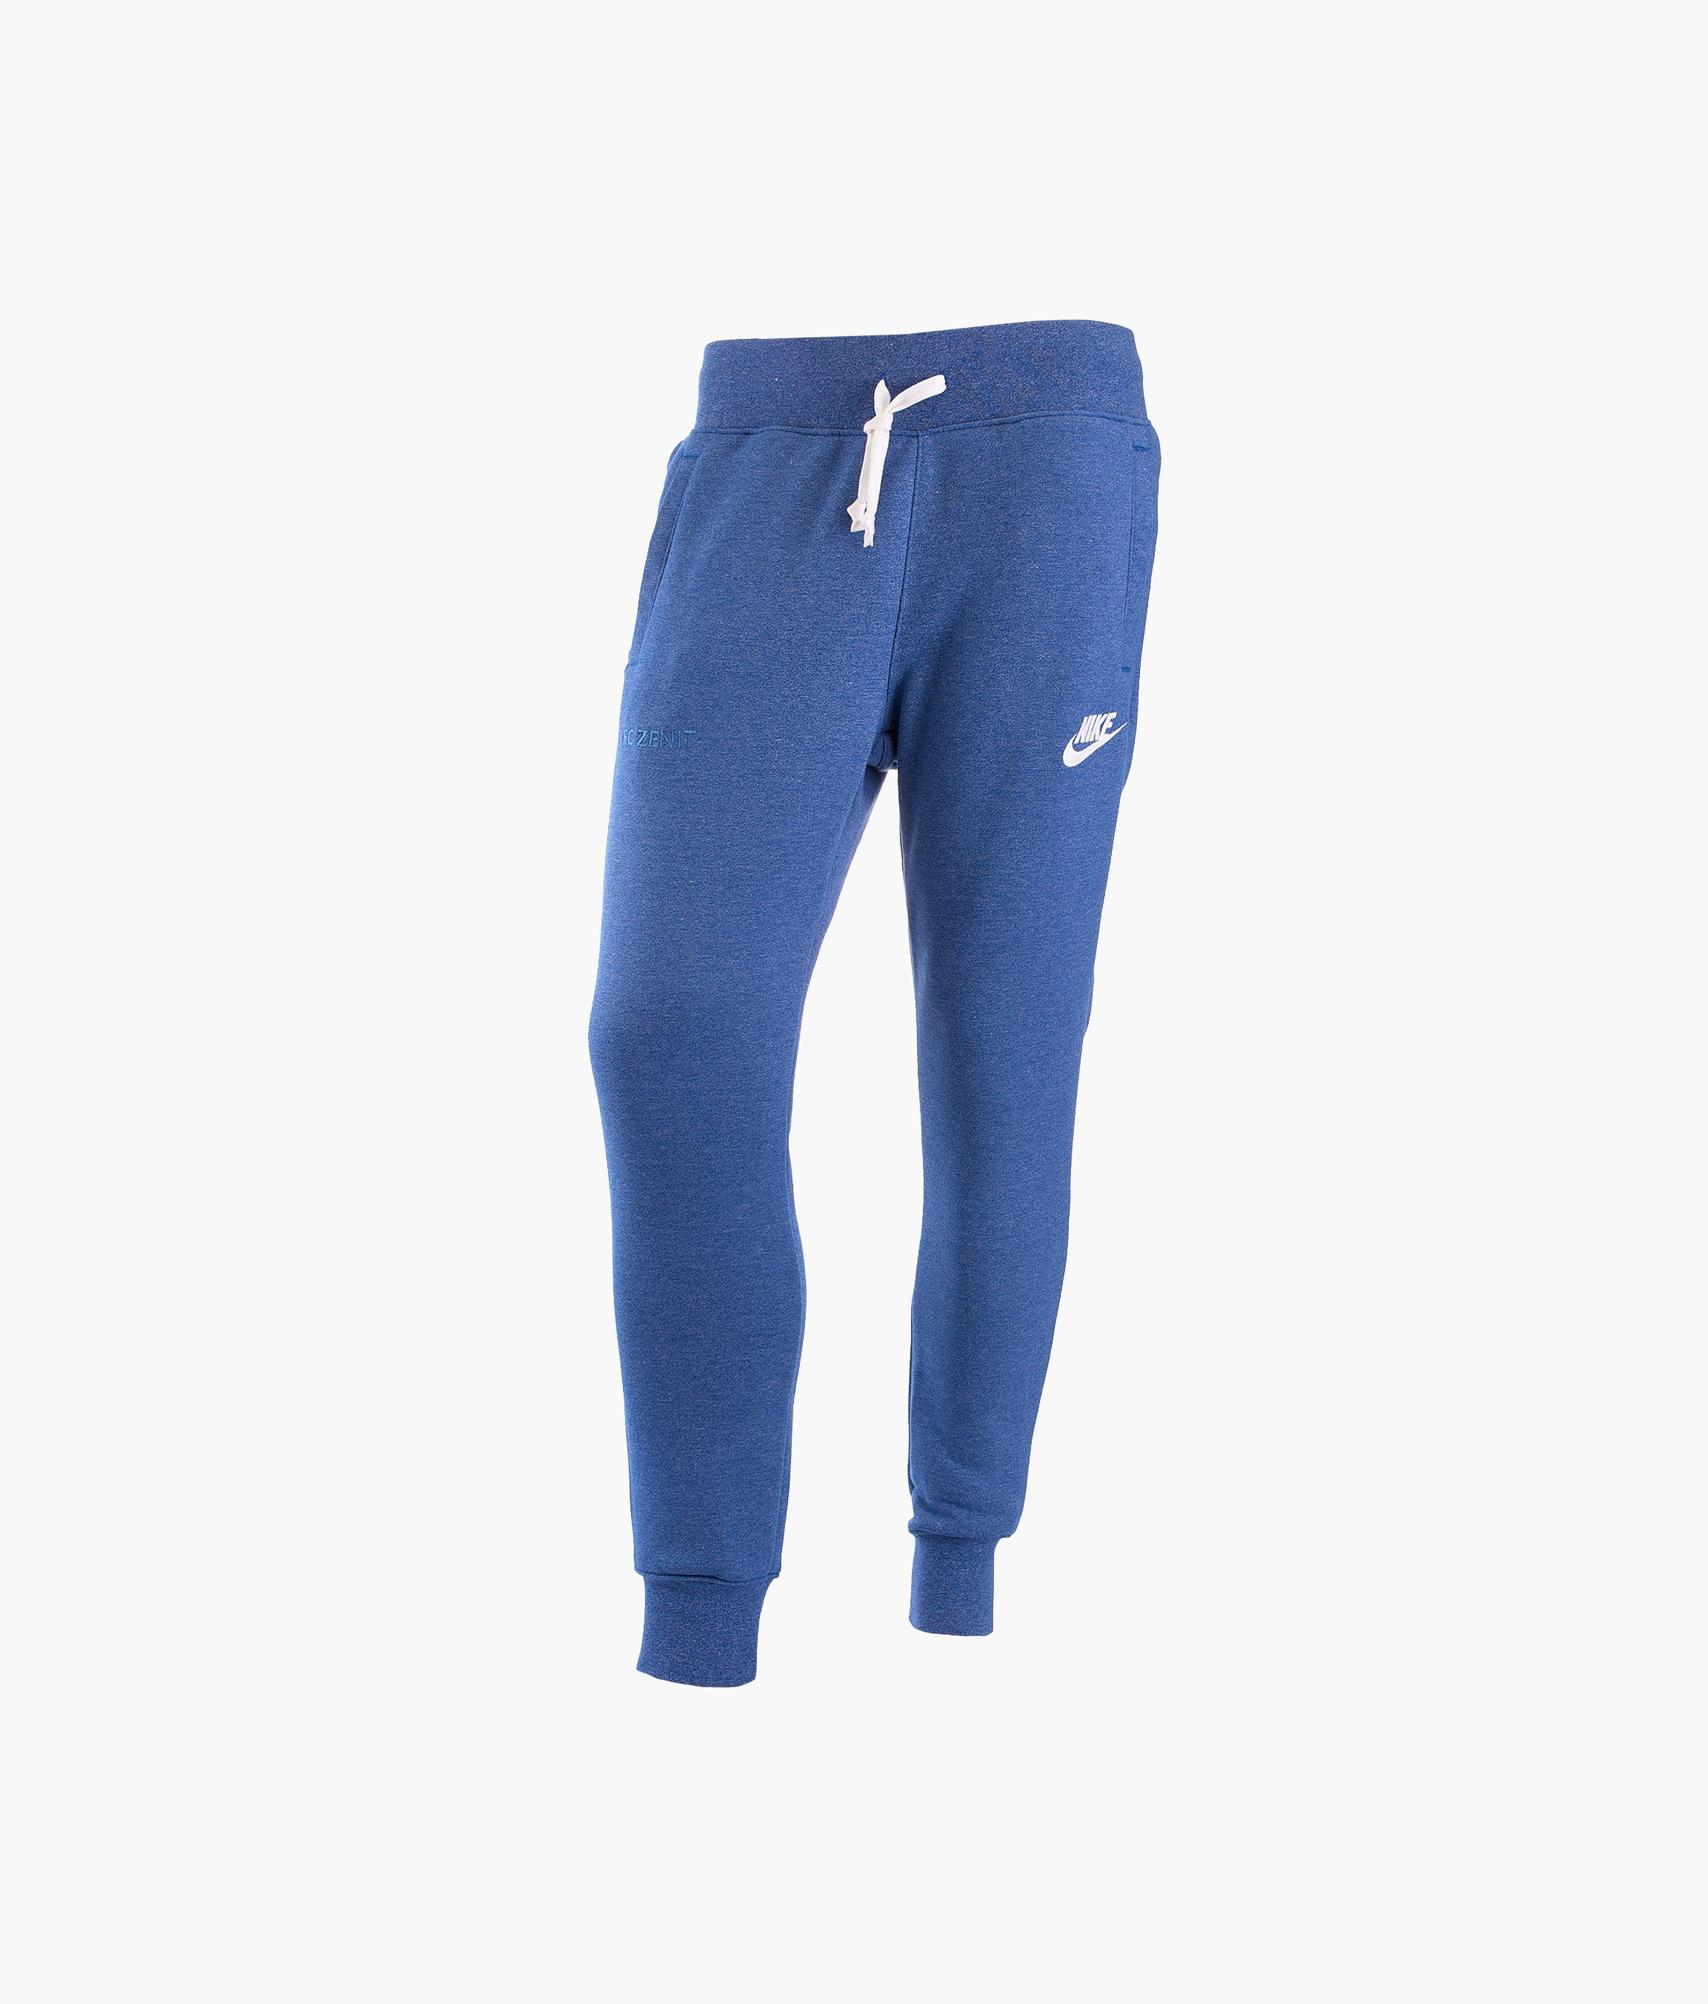 Брюки Nike Nike Цвет-Синий